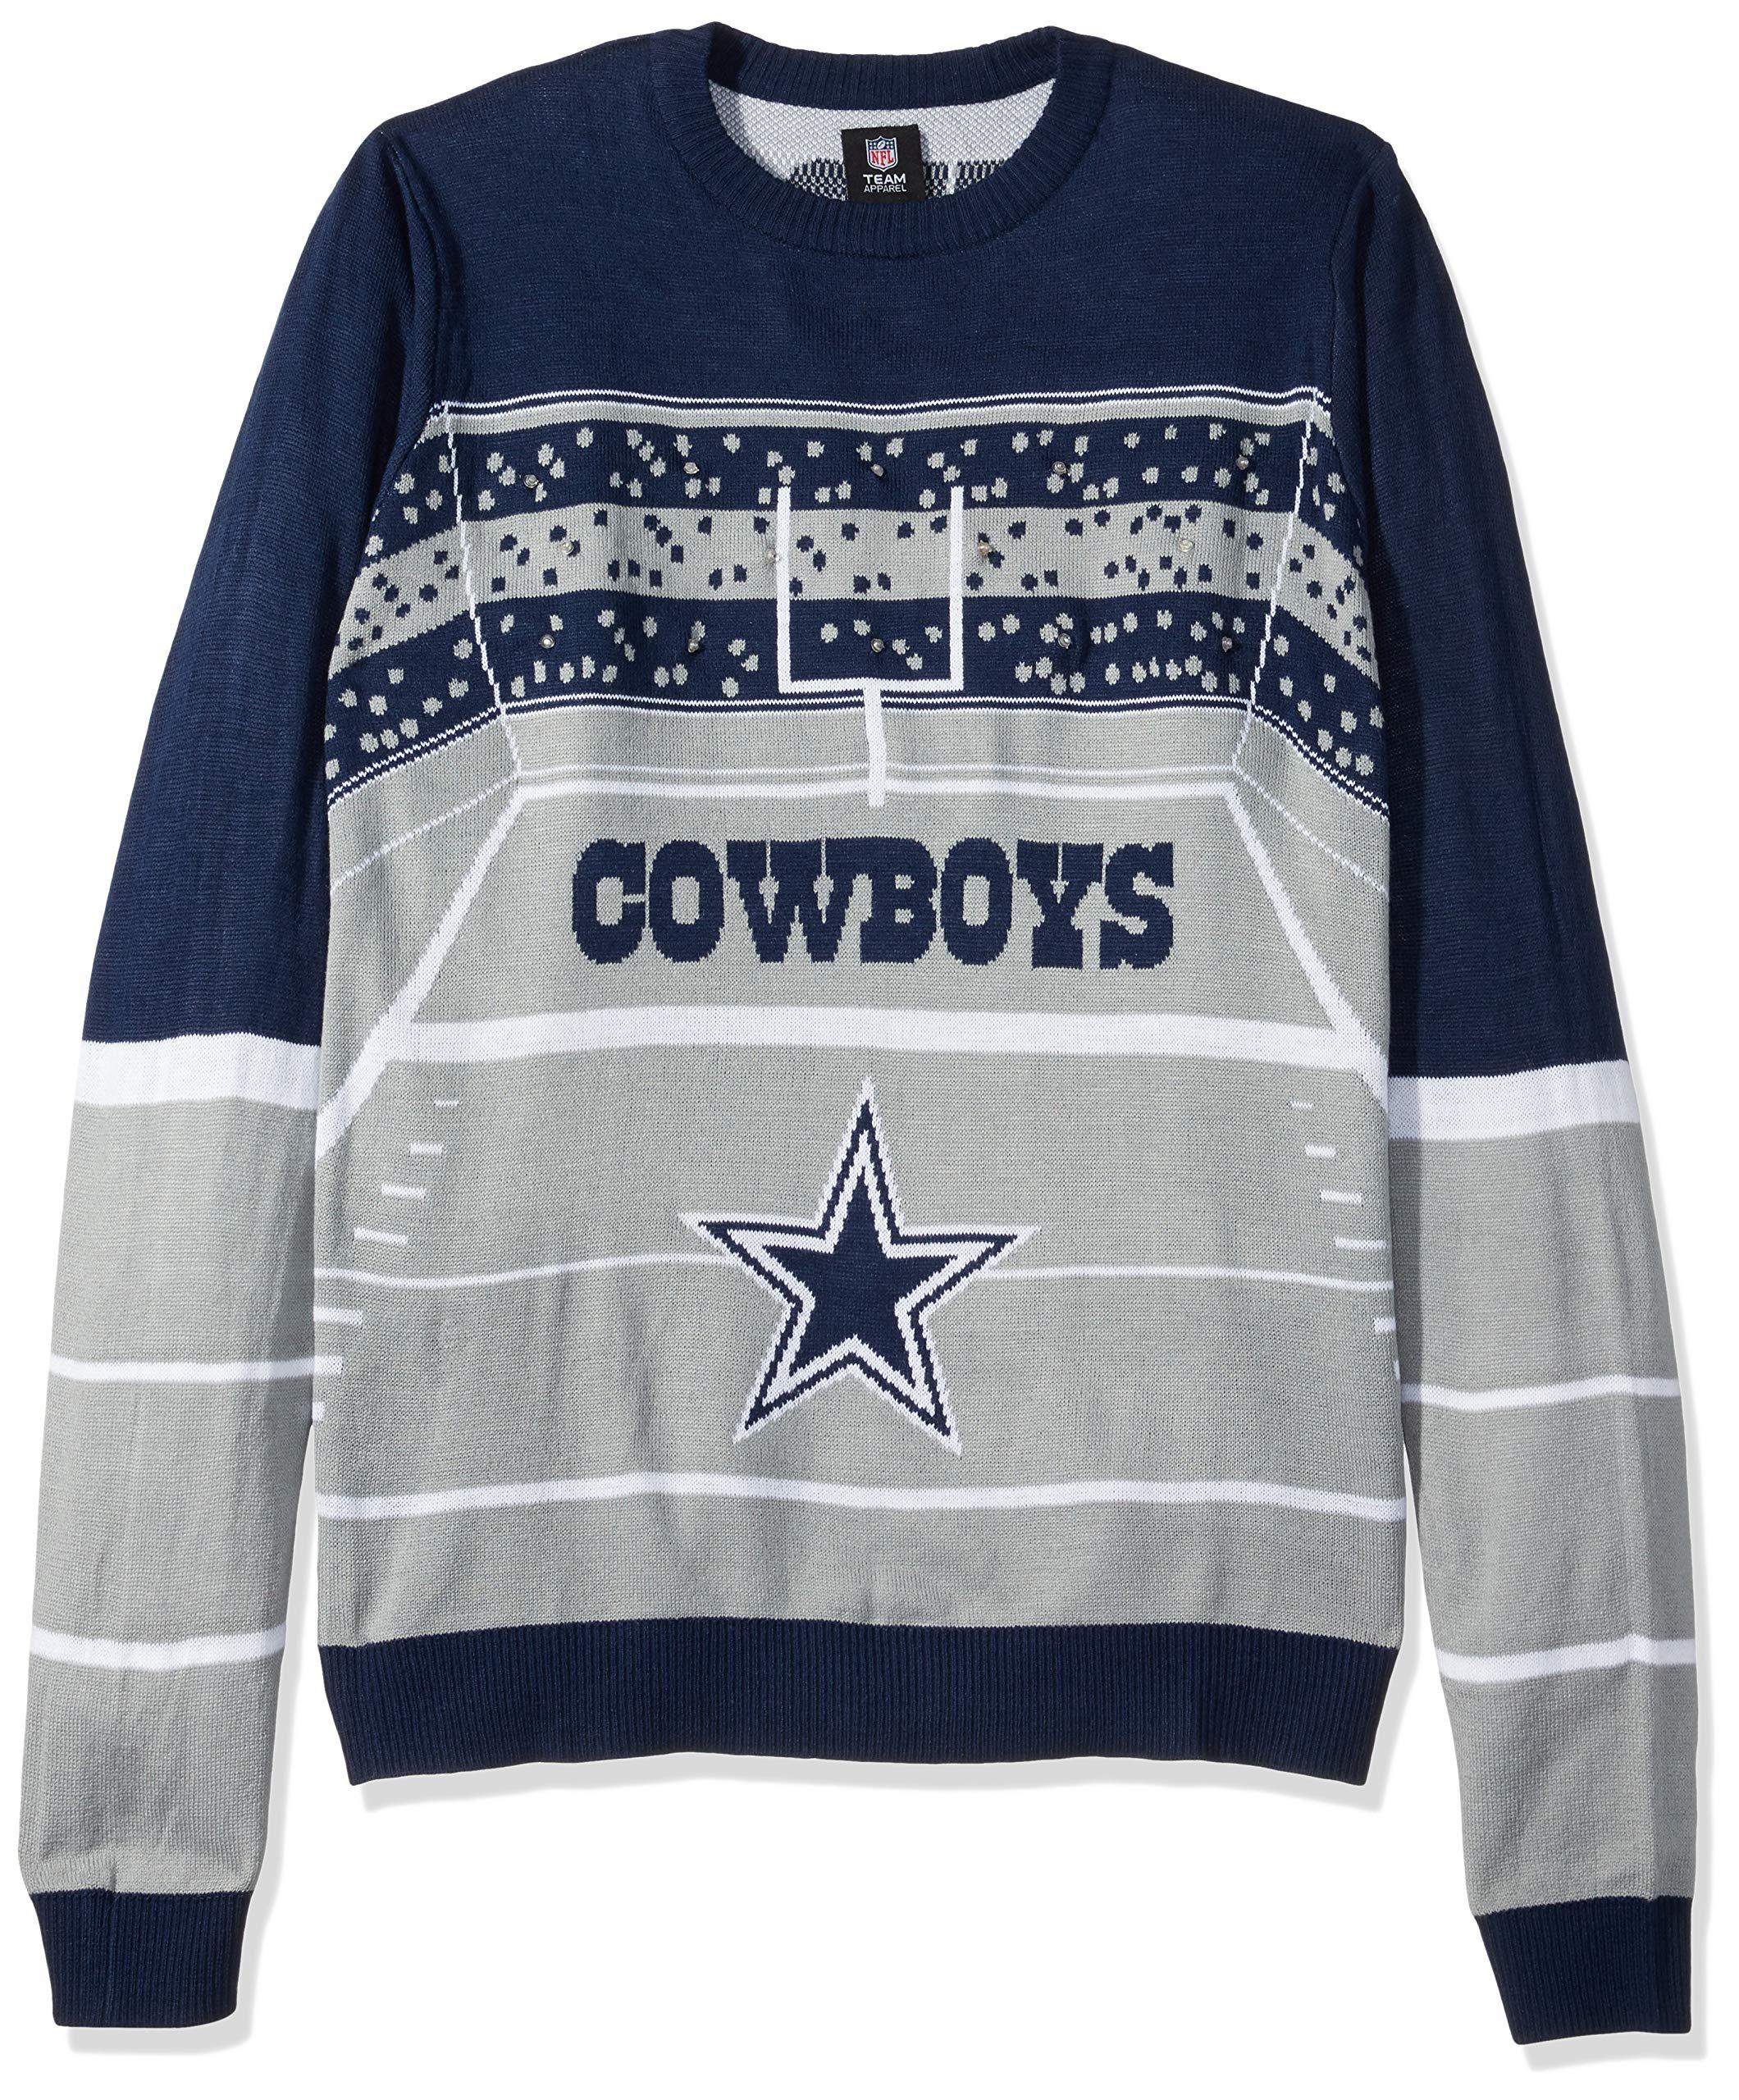 FOCO NFL Dallas Cowboys Mens Stadium Light Up Crew Neck Sweaterstadium Light Up Crew Neck Sweater, Team Color, Large